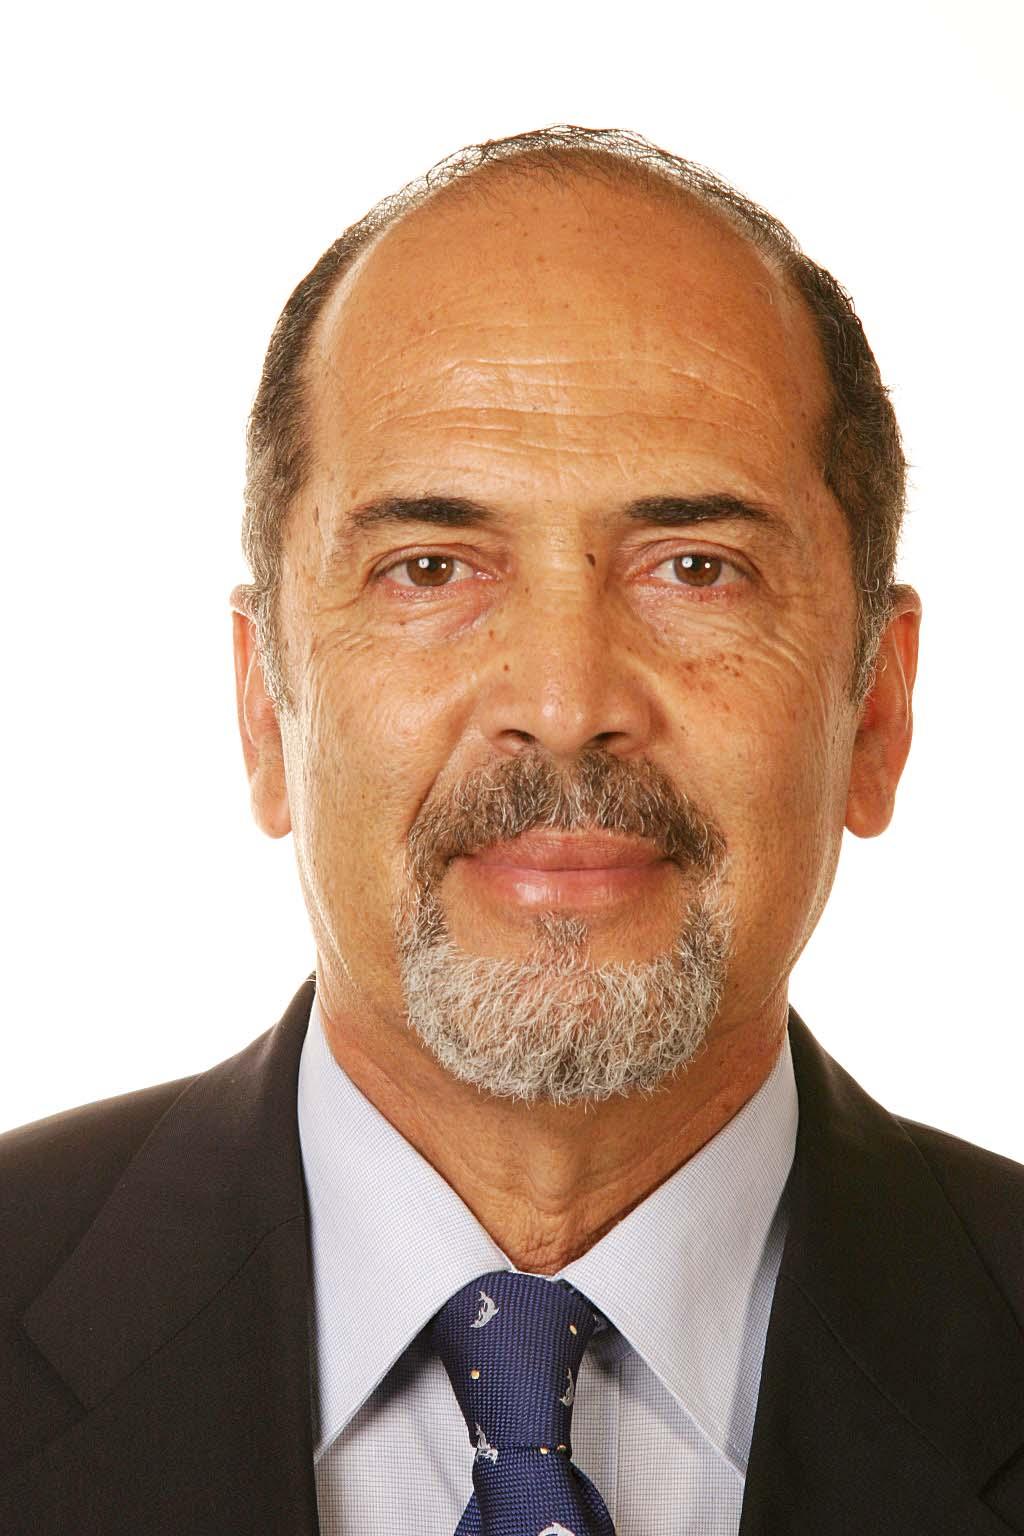 Sr. Diputado Eustaquio Juan Santana Gil - 052-1024x1536